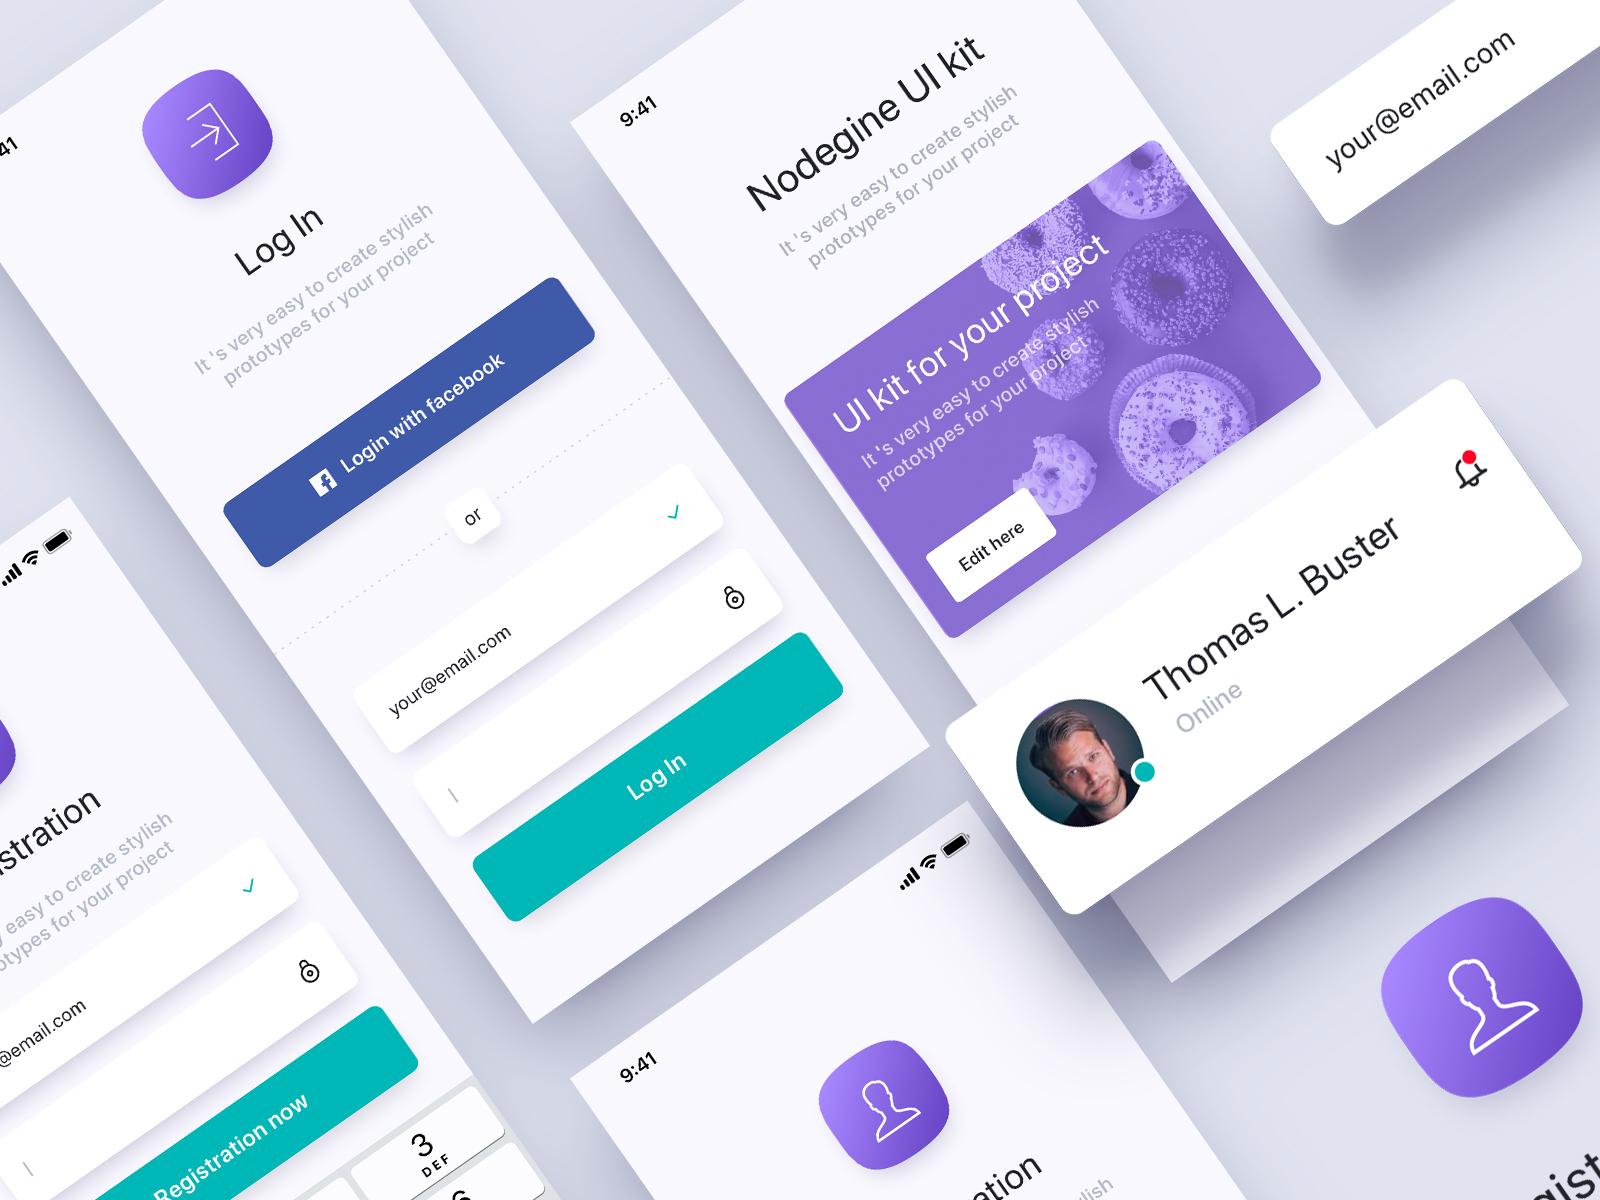 Nodegine design clean ui mobile user interface app dashboard ui kits ux design ui  ux design ui kit nodegine app